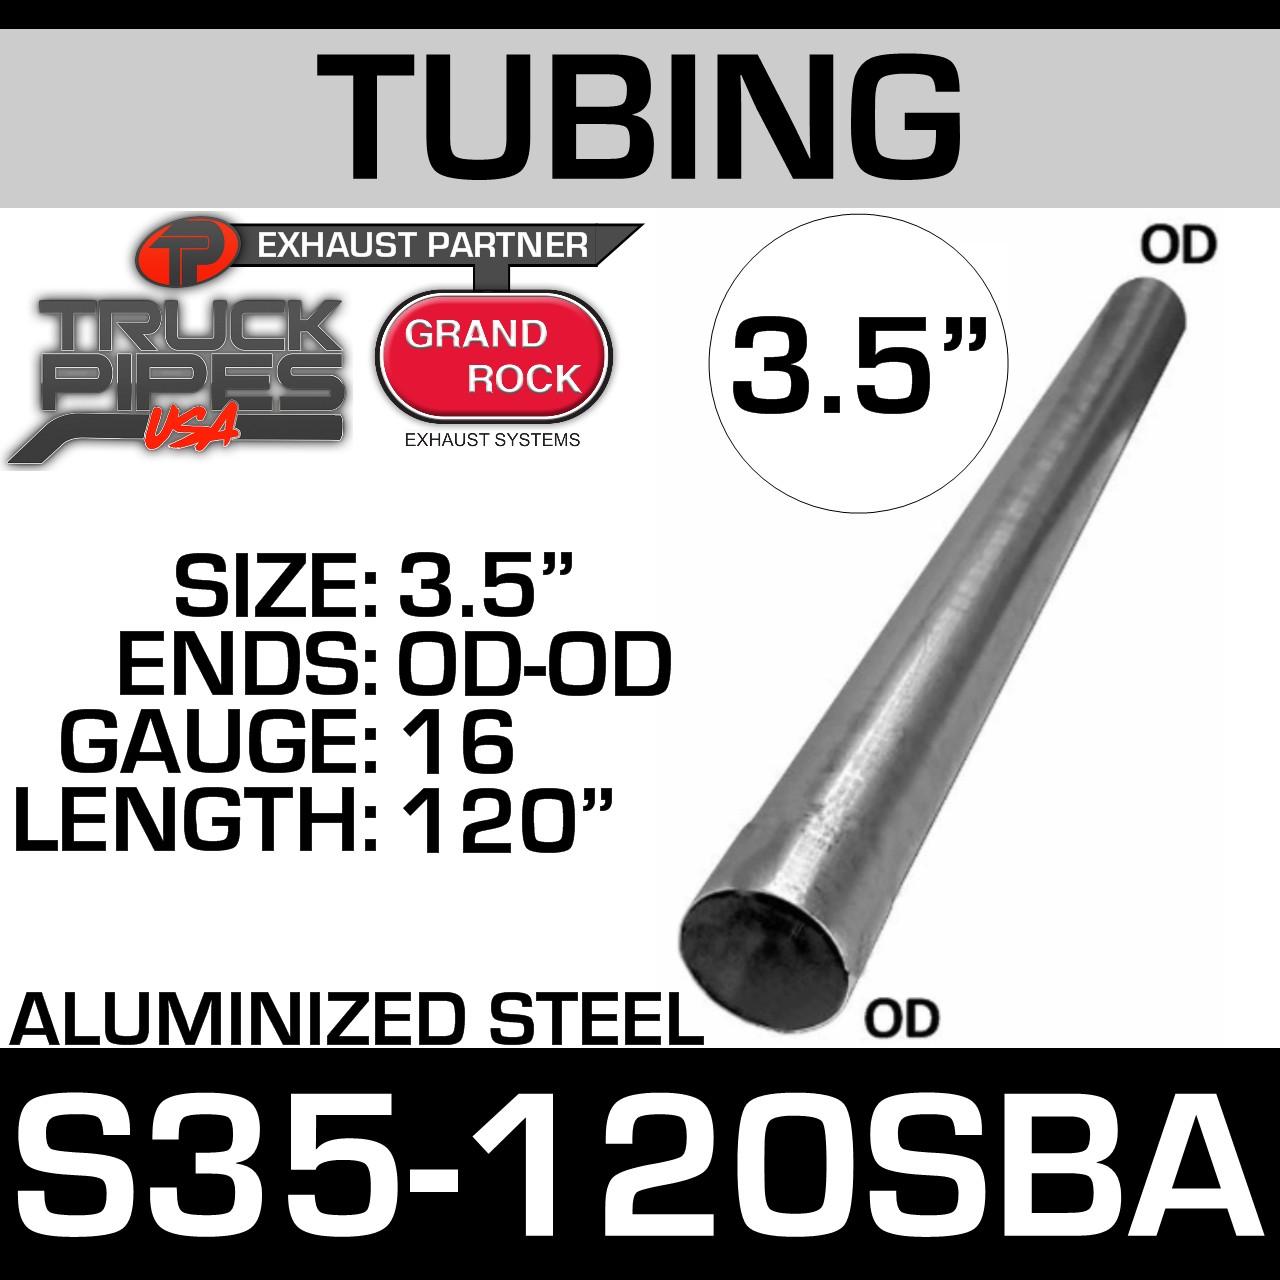 s35-120sba-aluminized-steel-exhaust-tubing-3-5-inch-diameter-od-end-120-inches-long.jpg